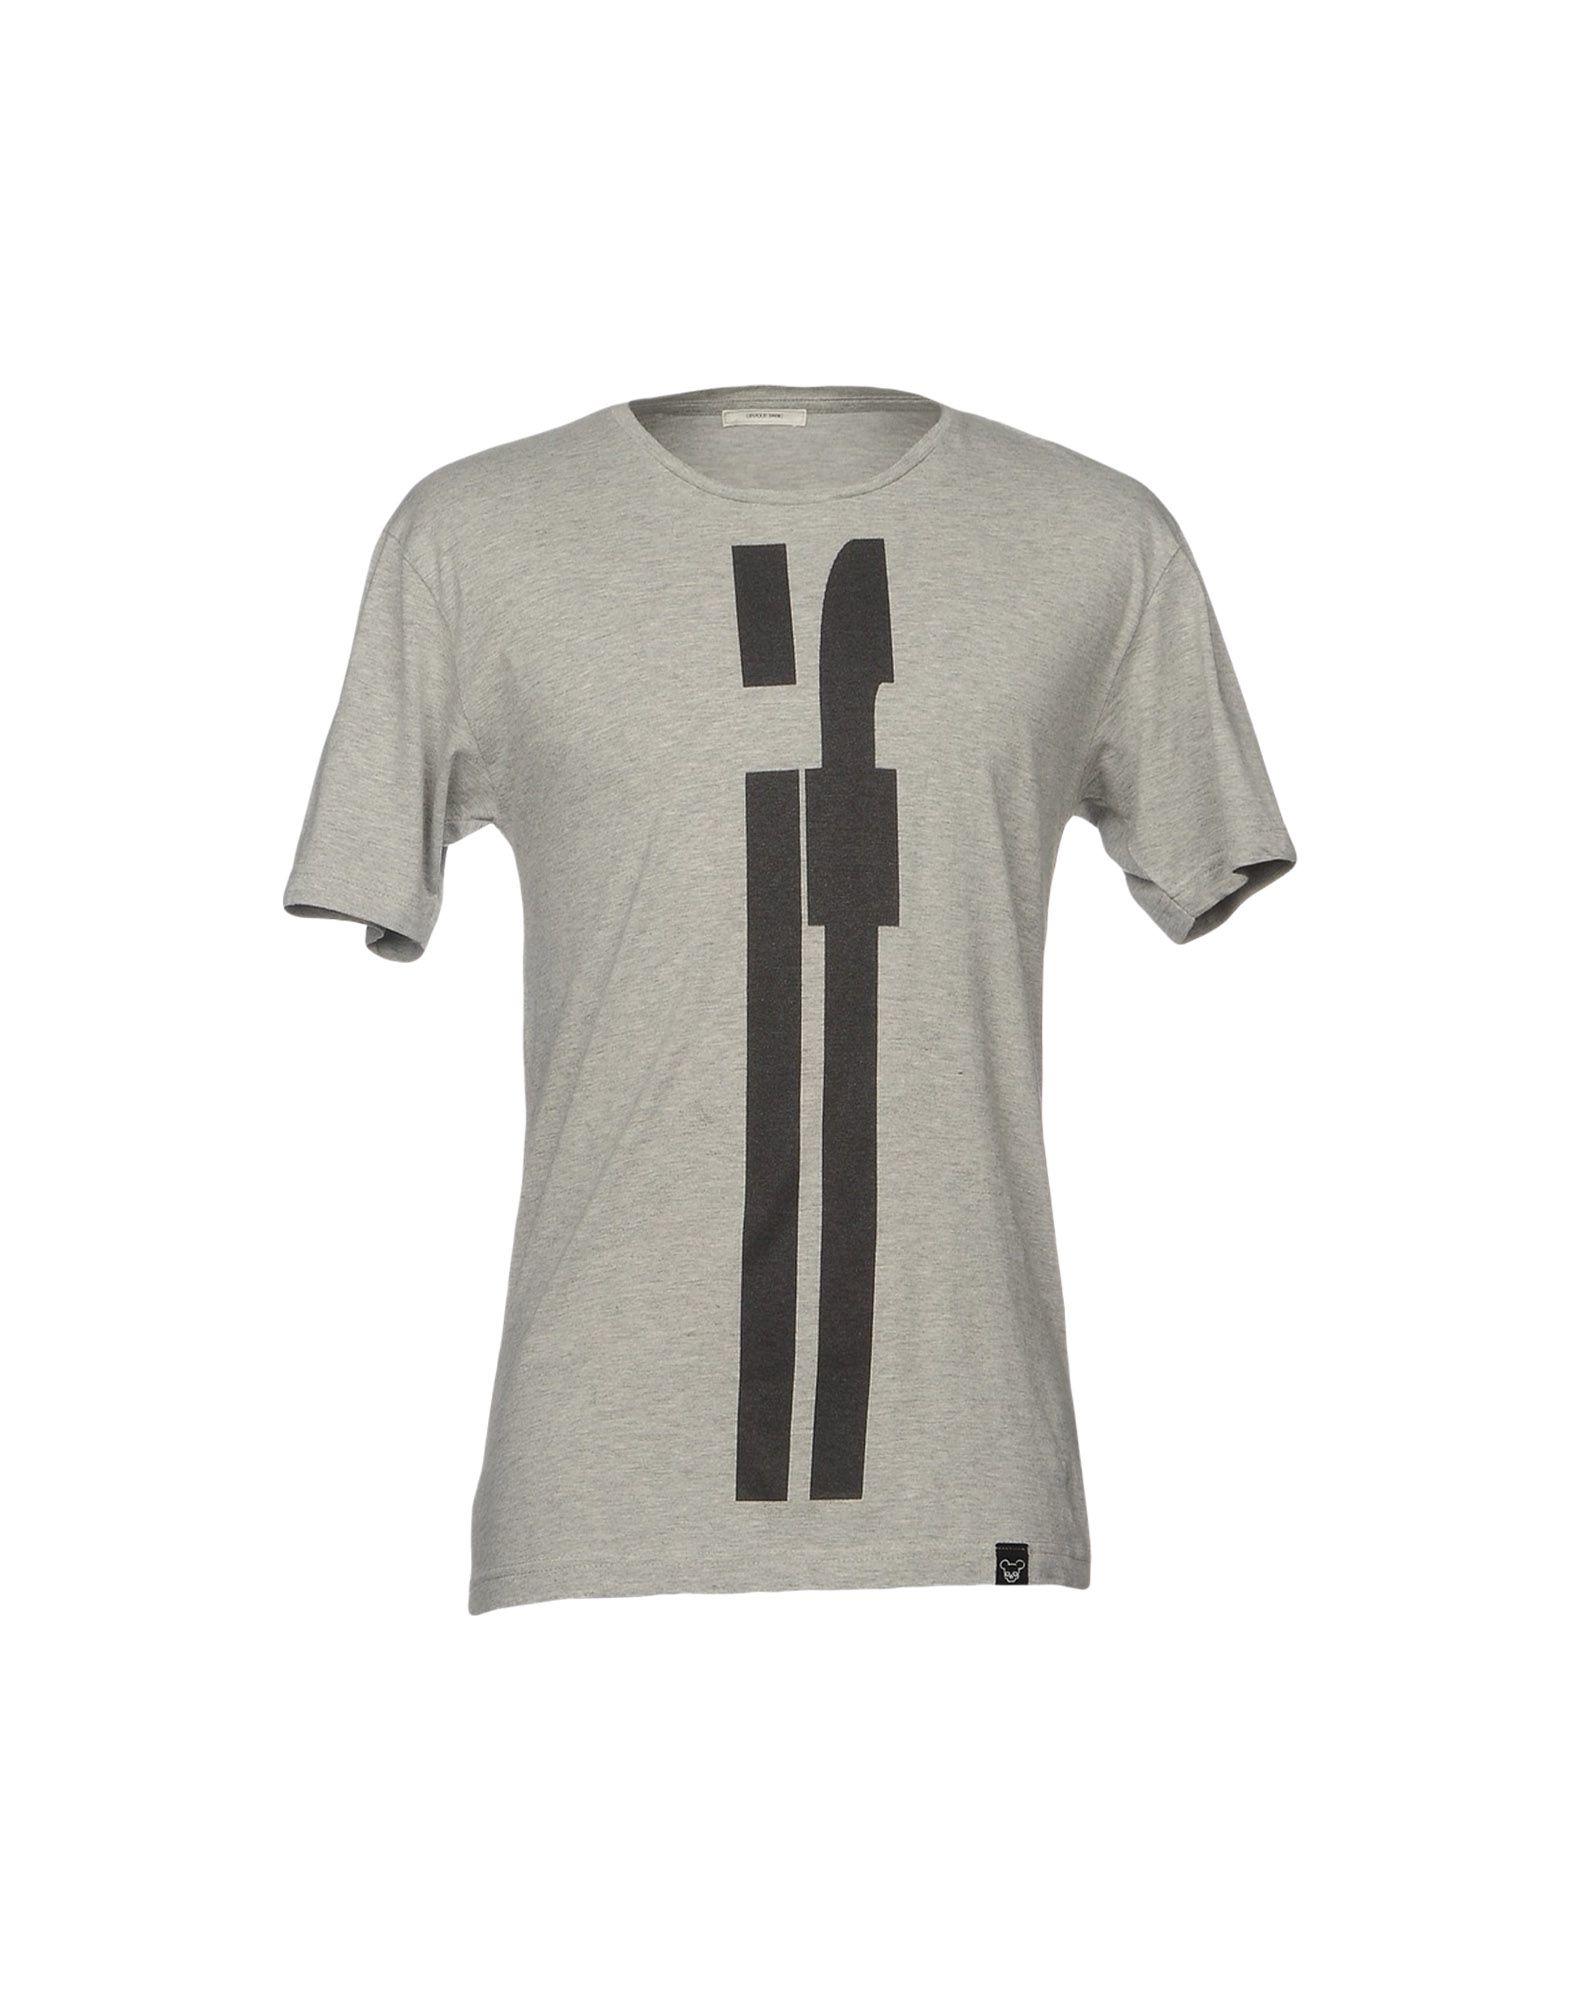 T-Shirt Obvious Basic Uomo 12097228JJ - 12097228JJ Uomo 53d6df